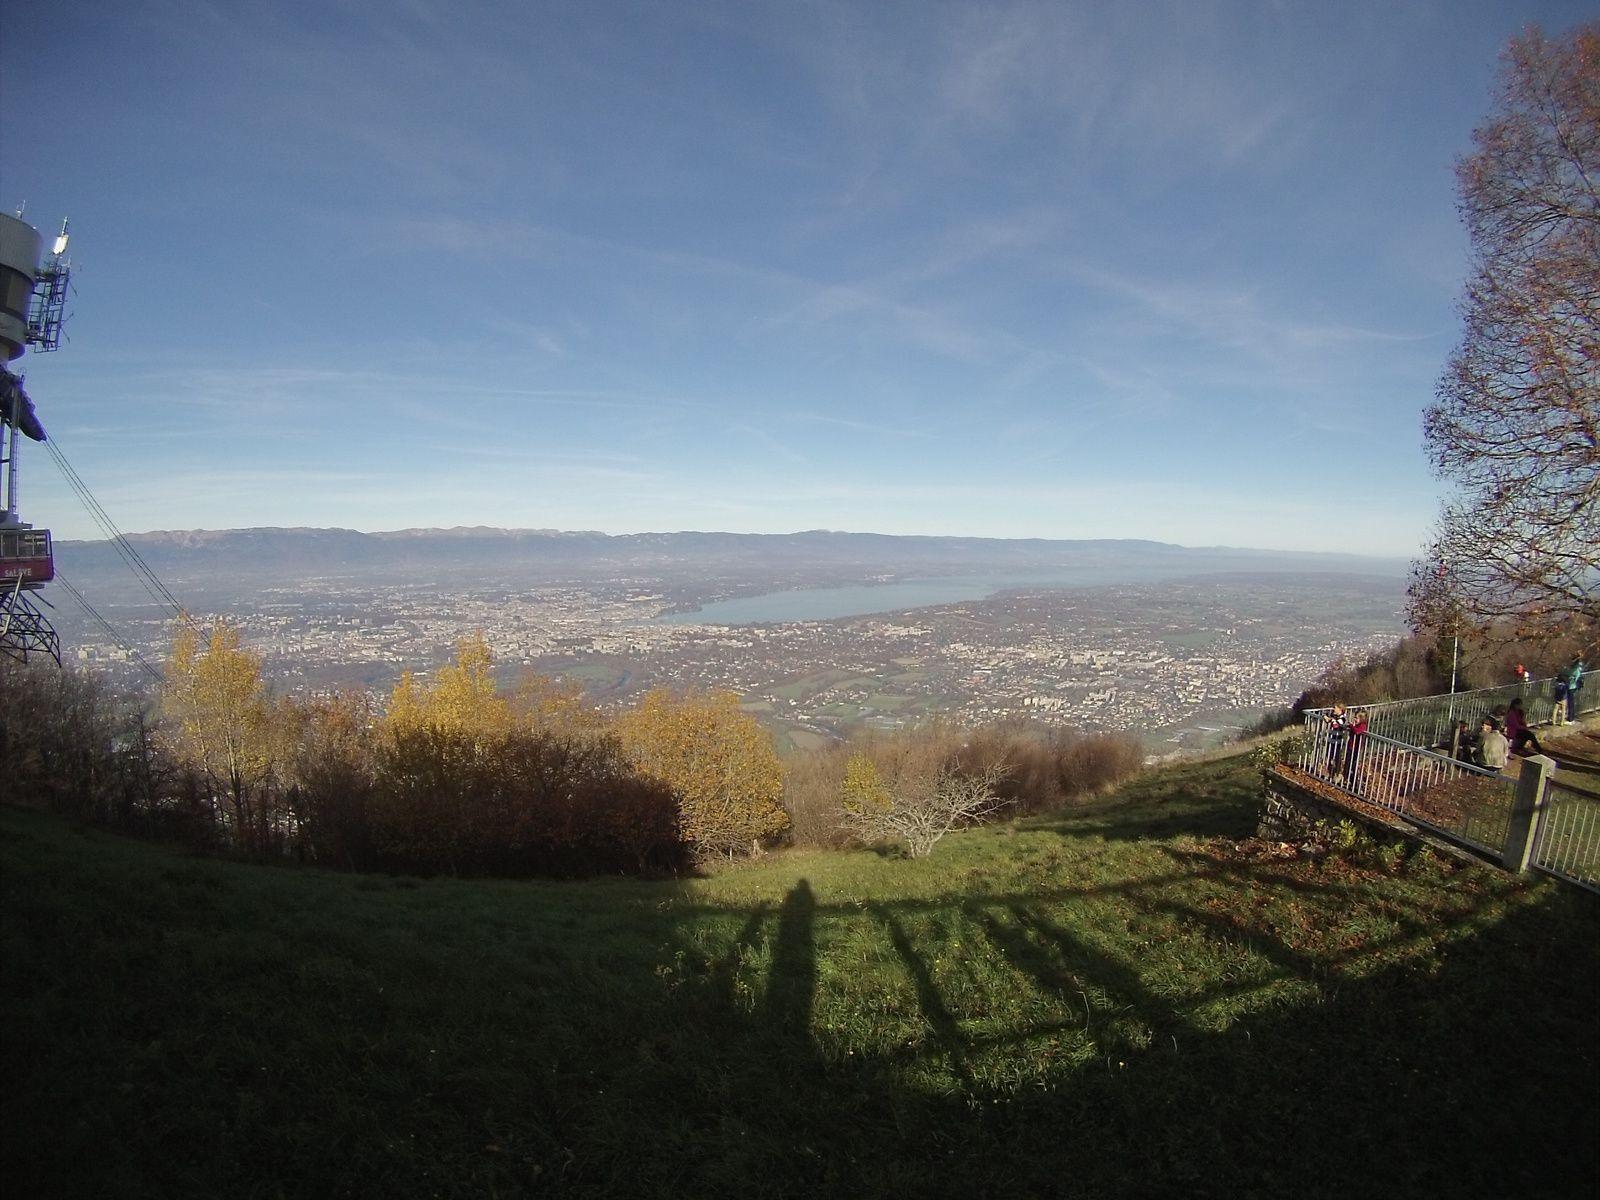 8 novembre 2015 - Cardio rase-moquette au Salève